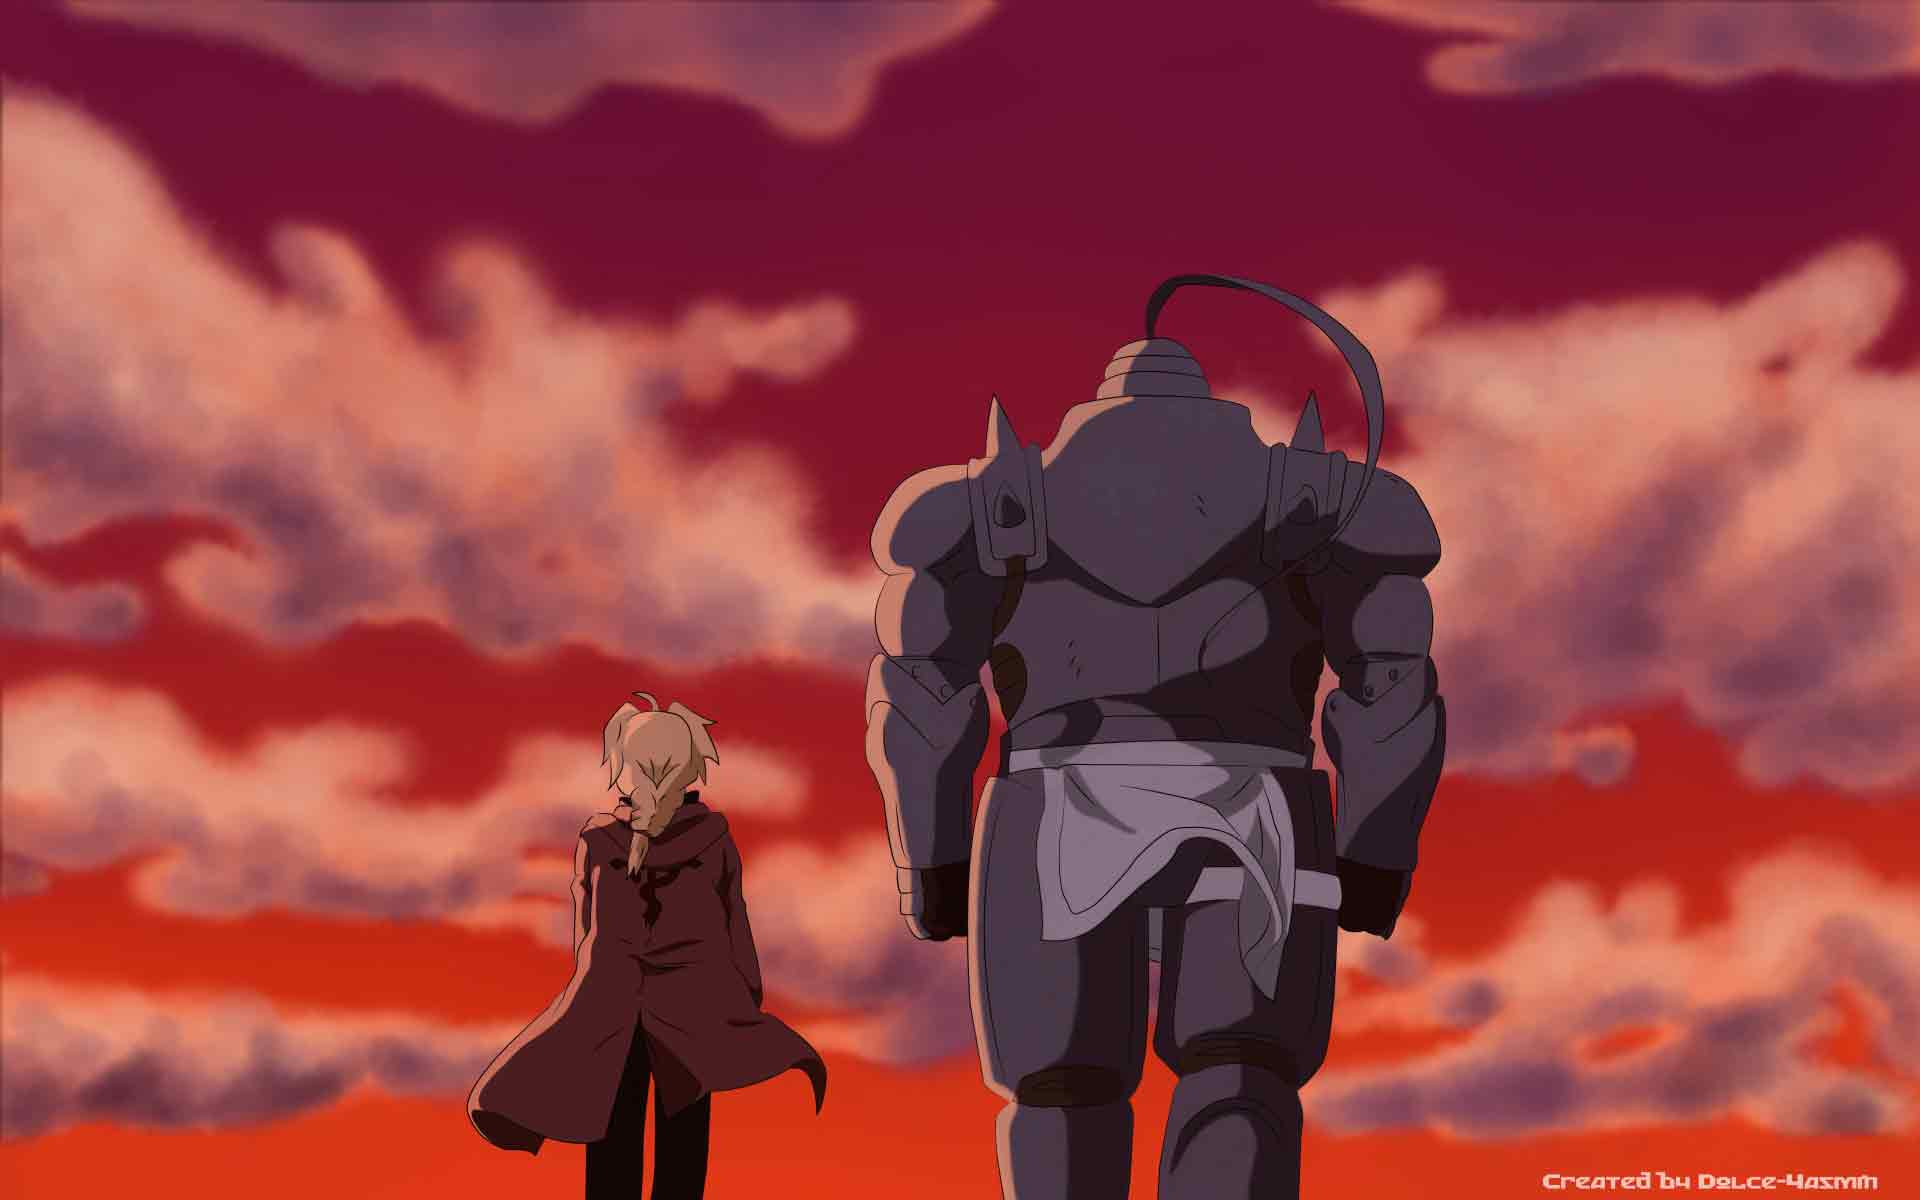 Fullmetal-Alchemist-ตัวละคร-ที่ทุกคนชื่นชอบ2